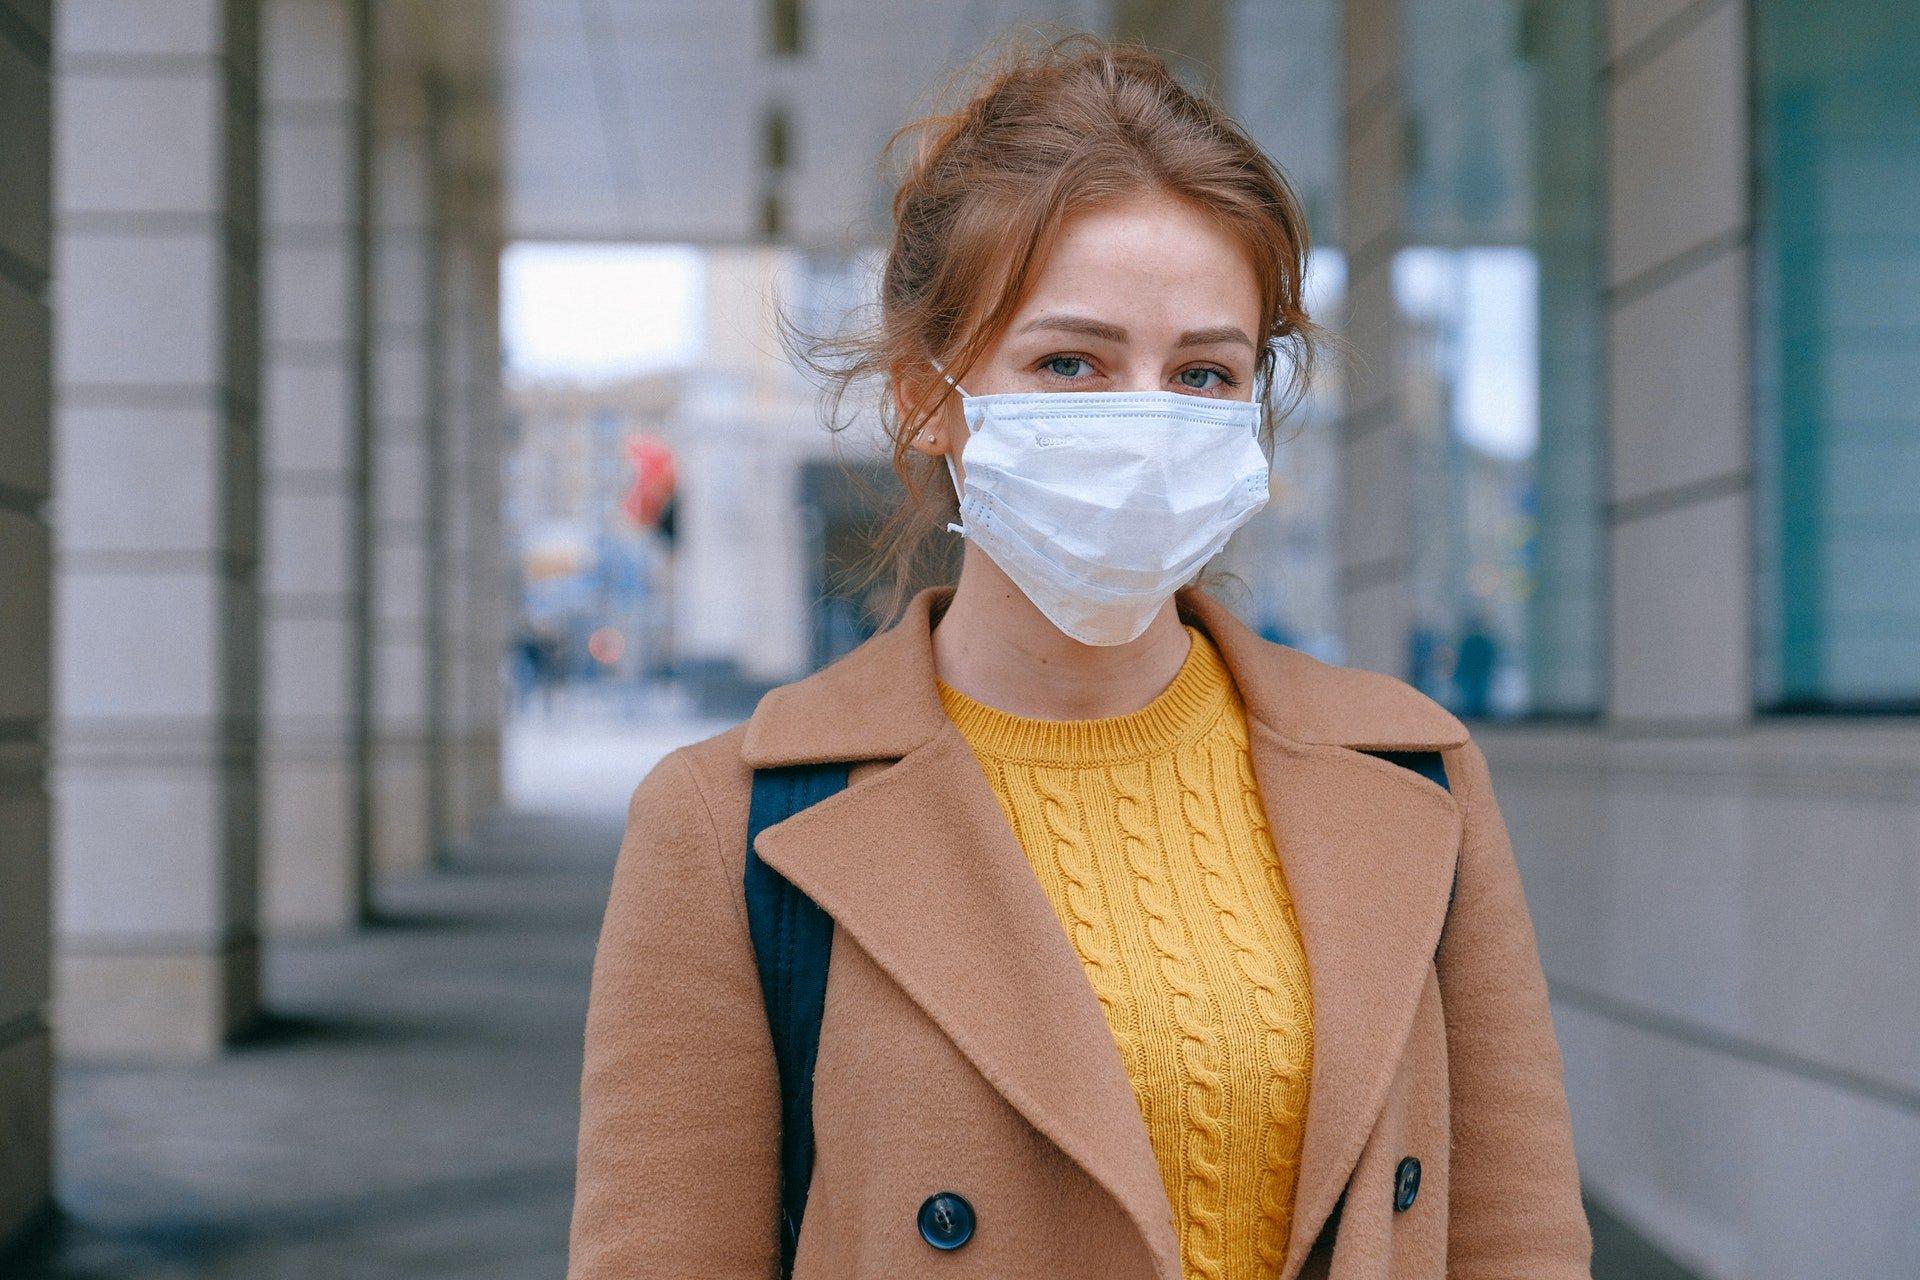 Woman Wearing Face Mask - COVID-19 Pandemic